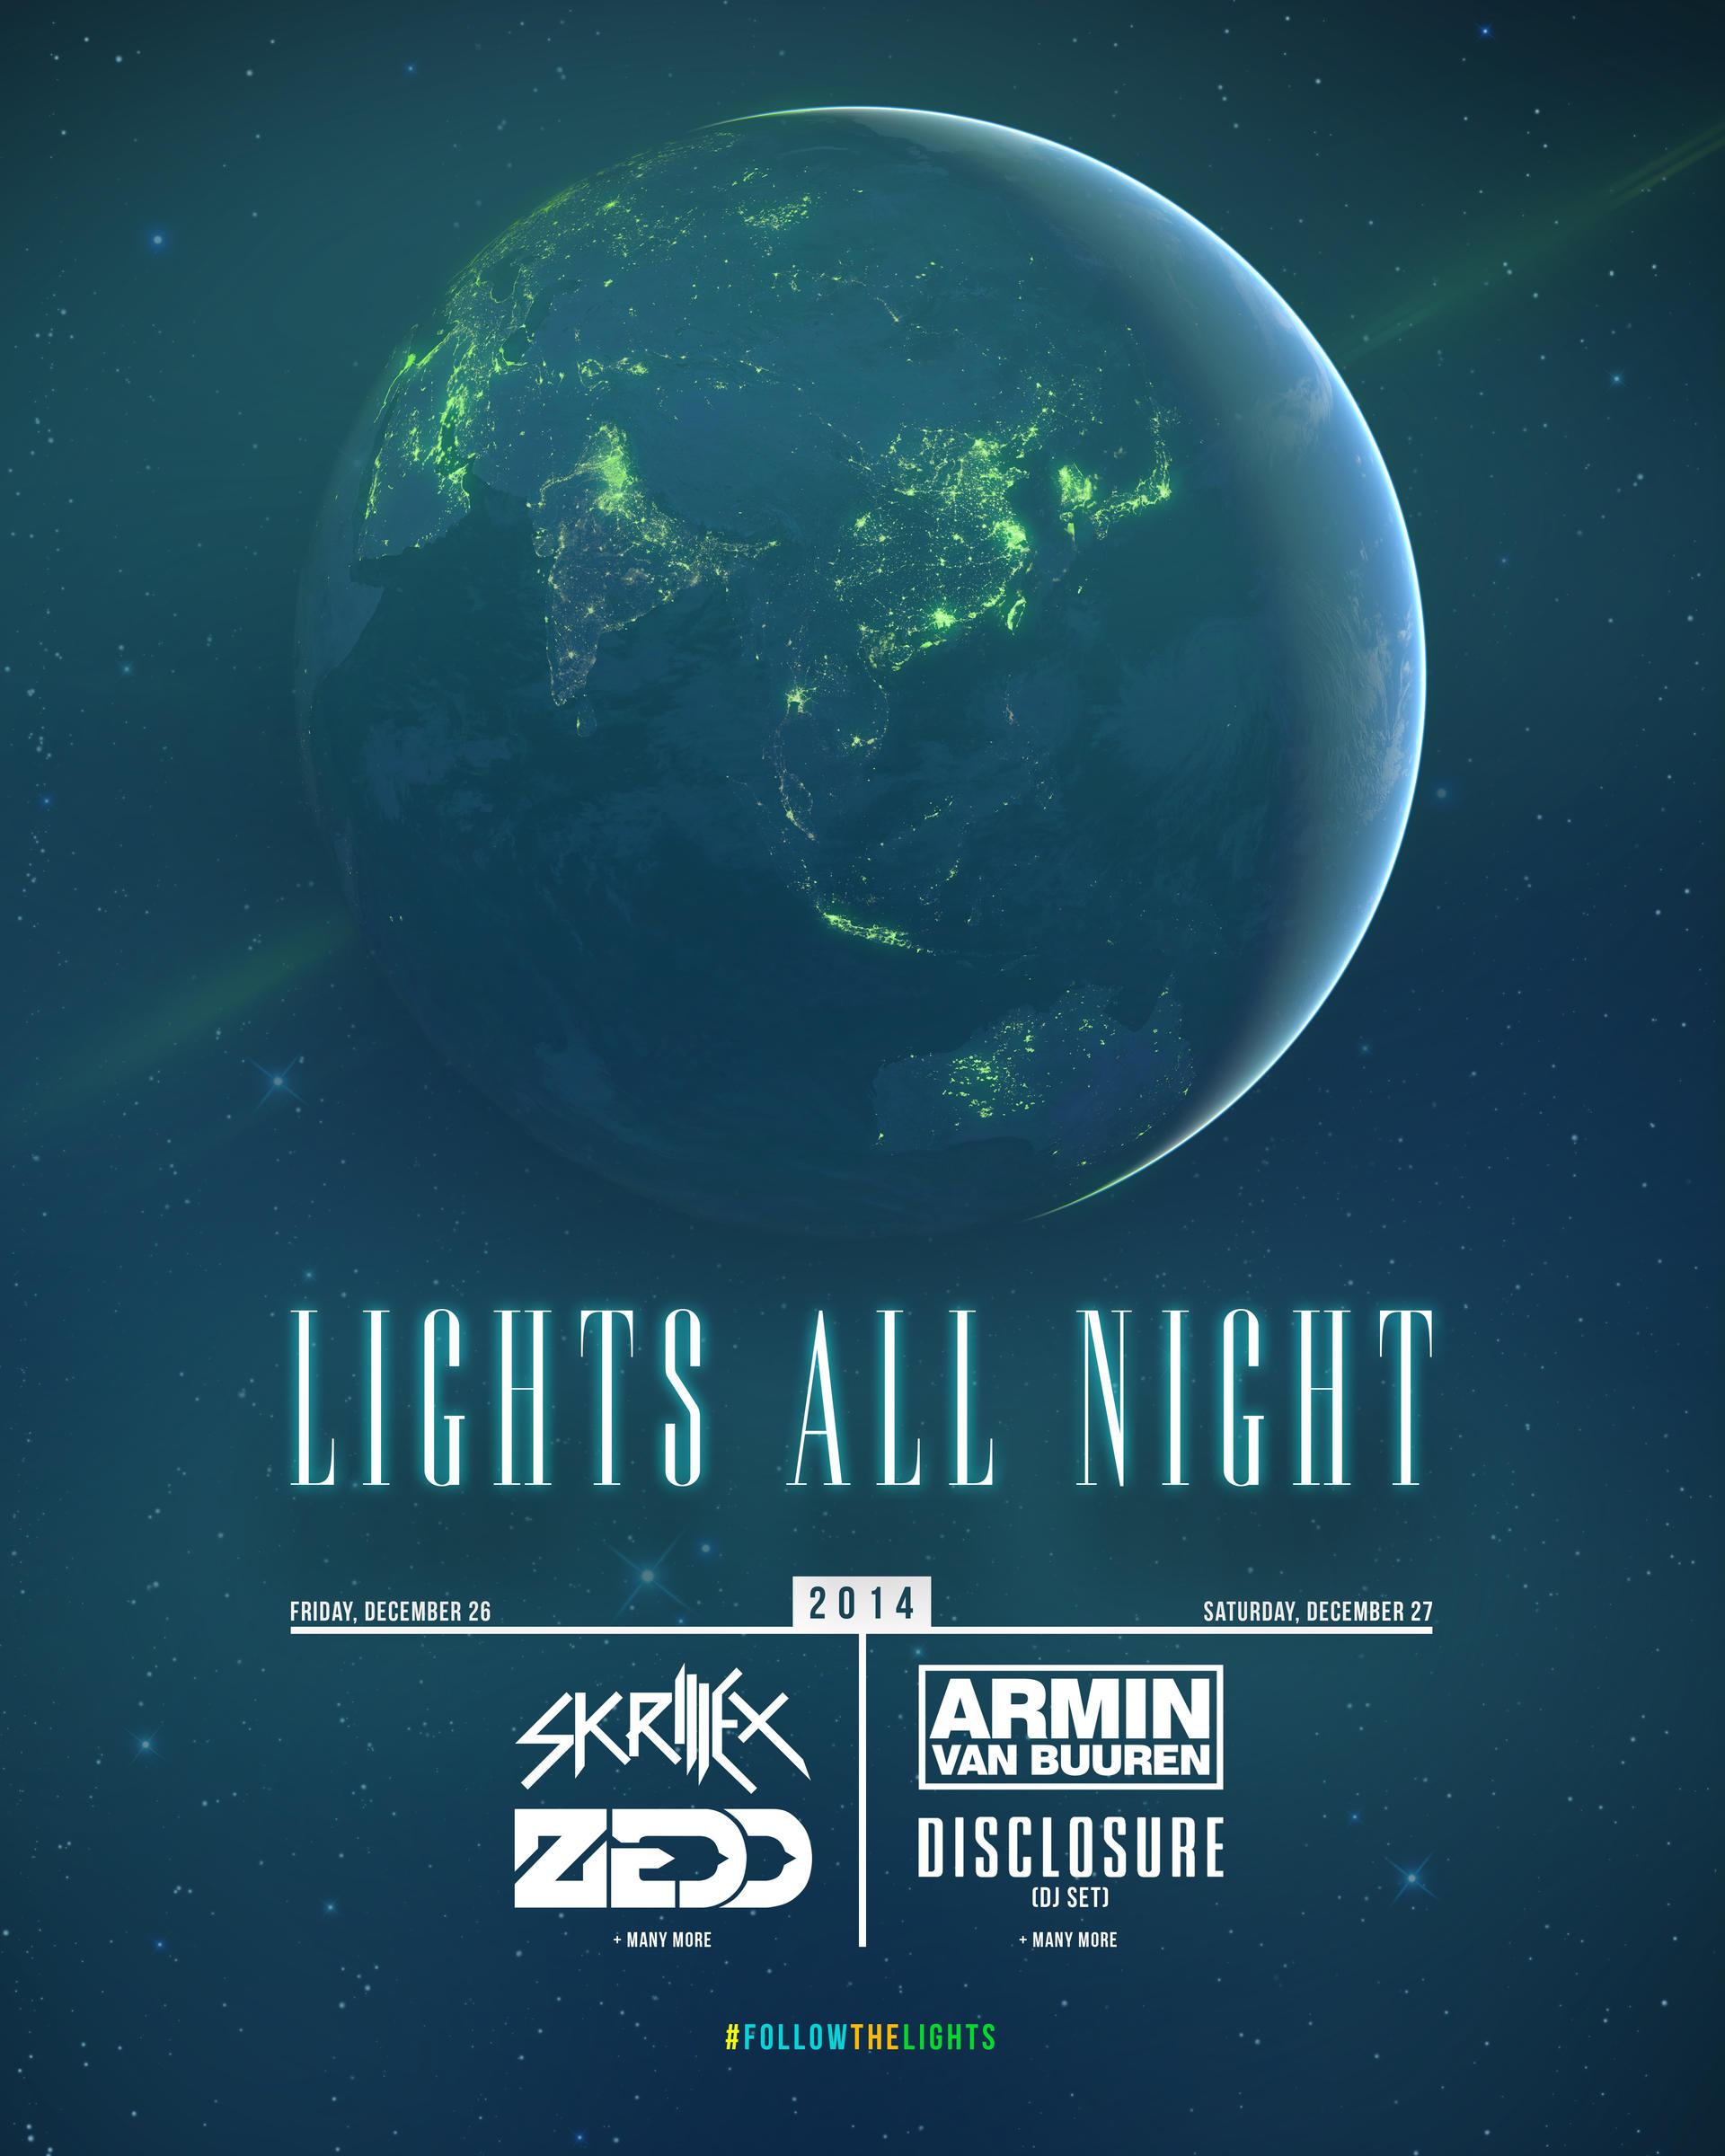 Lights All Night 2014 Poster